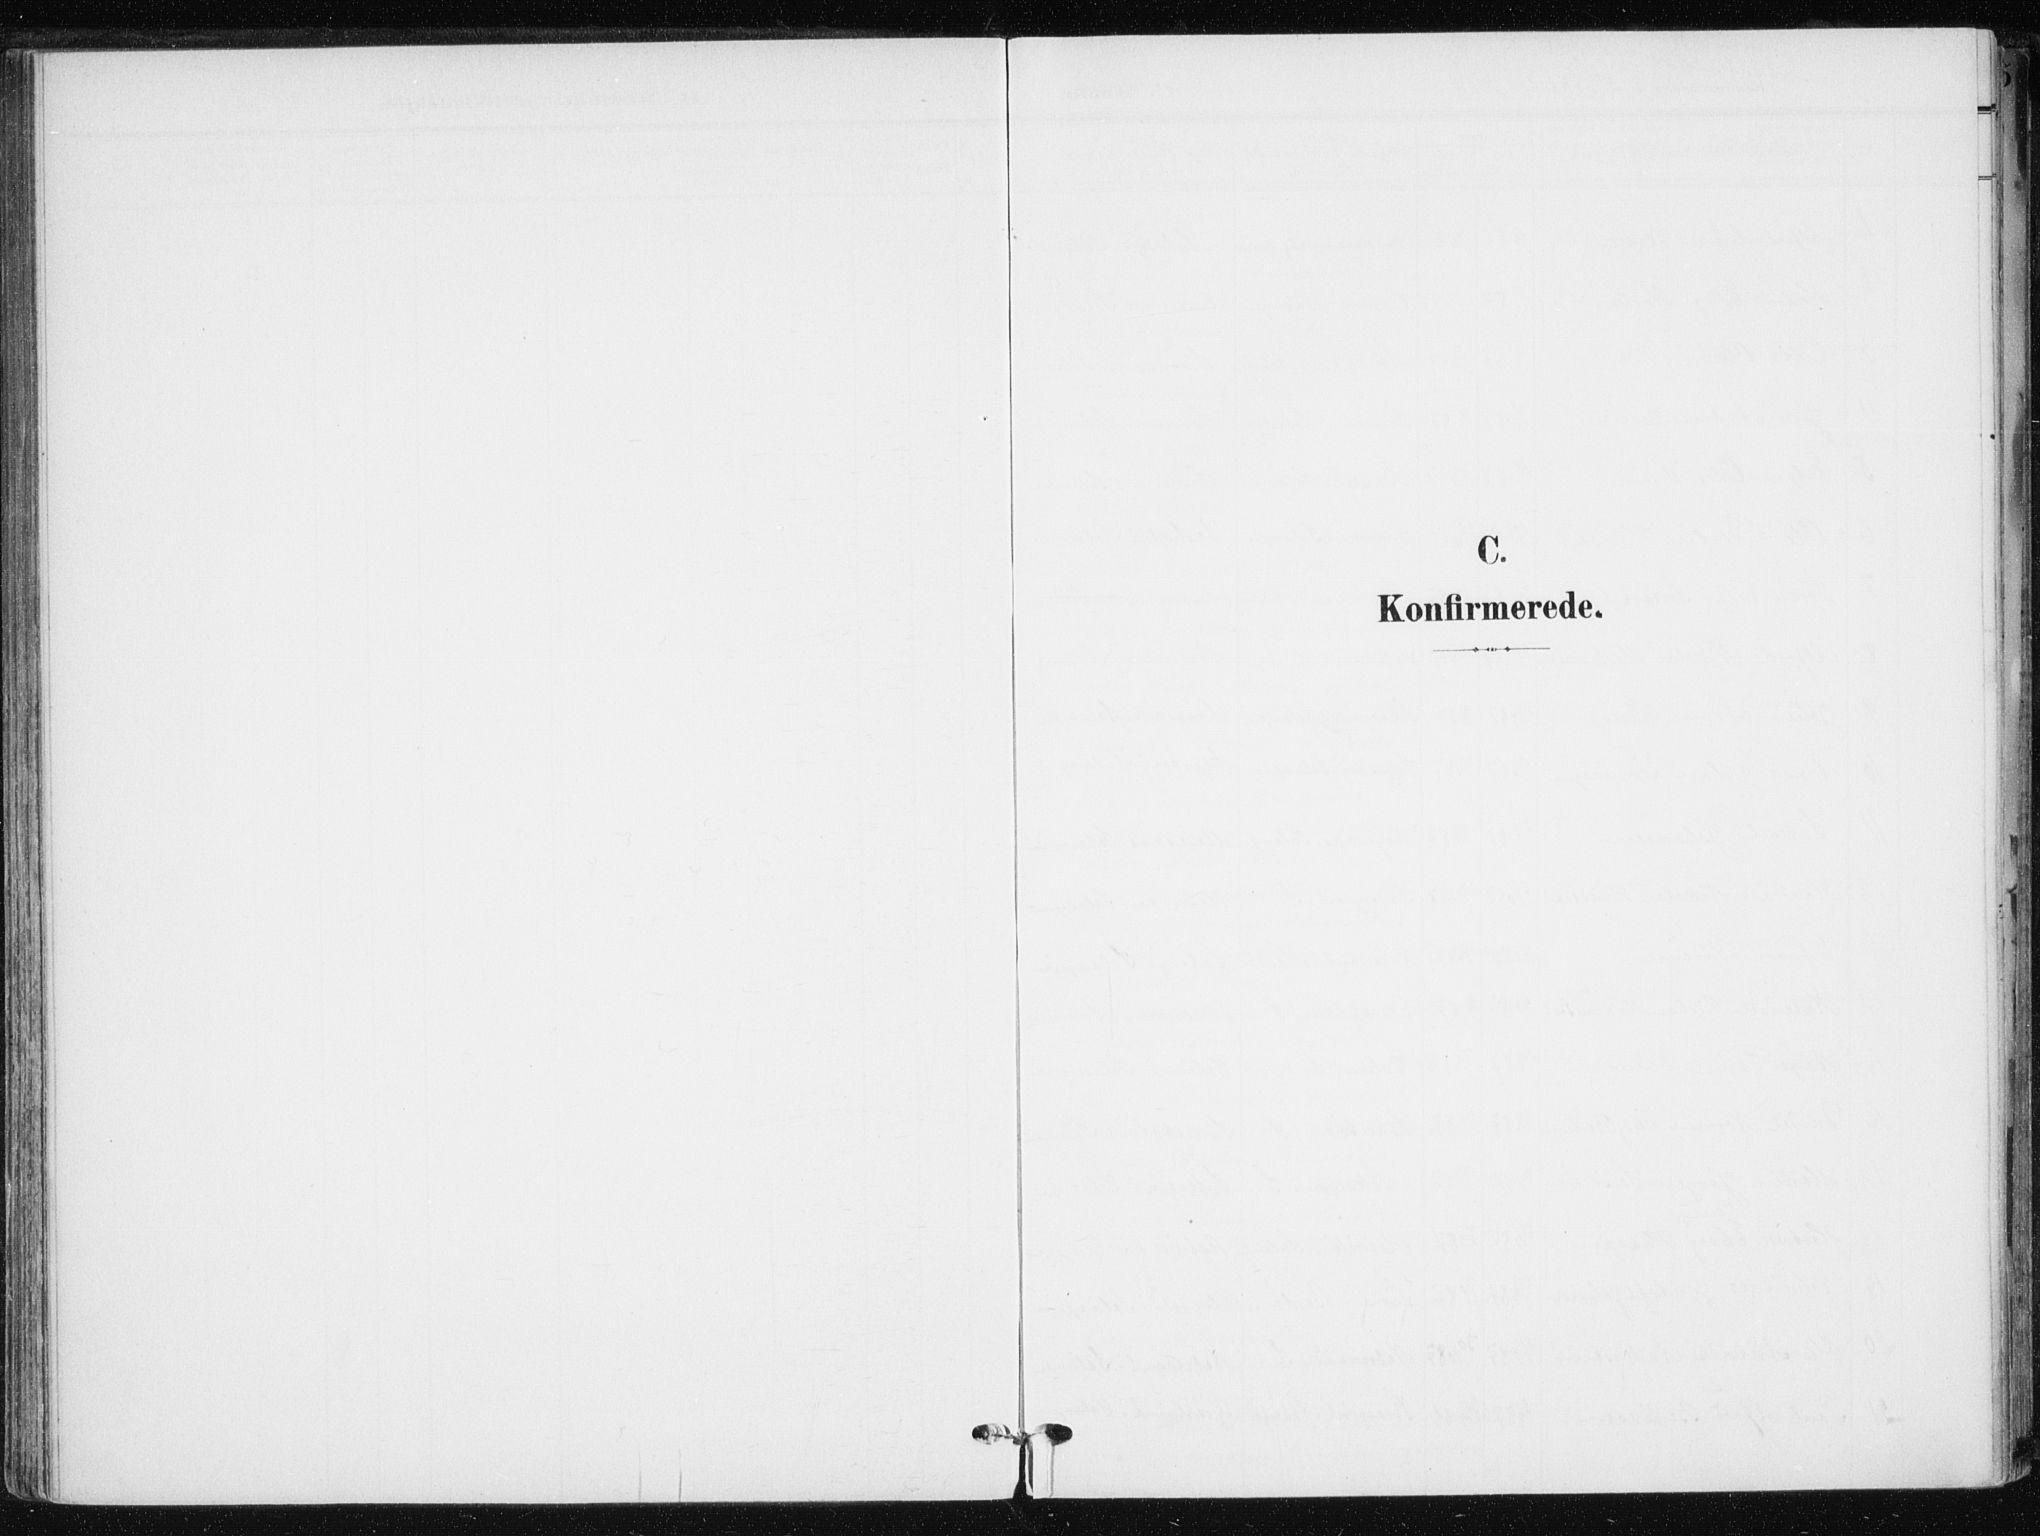 SATØ, Salangen sokneprestembete, H/Ha/L0002kirke: Ministerialbok nr. 2, 1902-1911